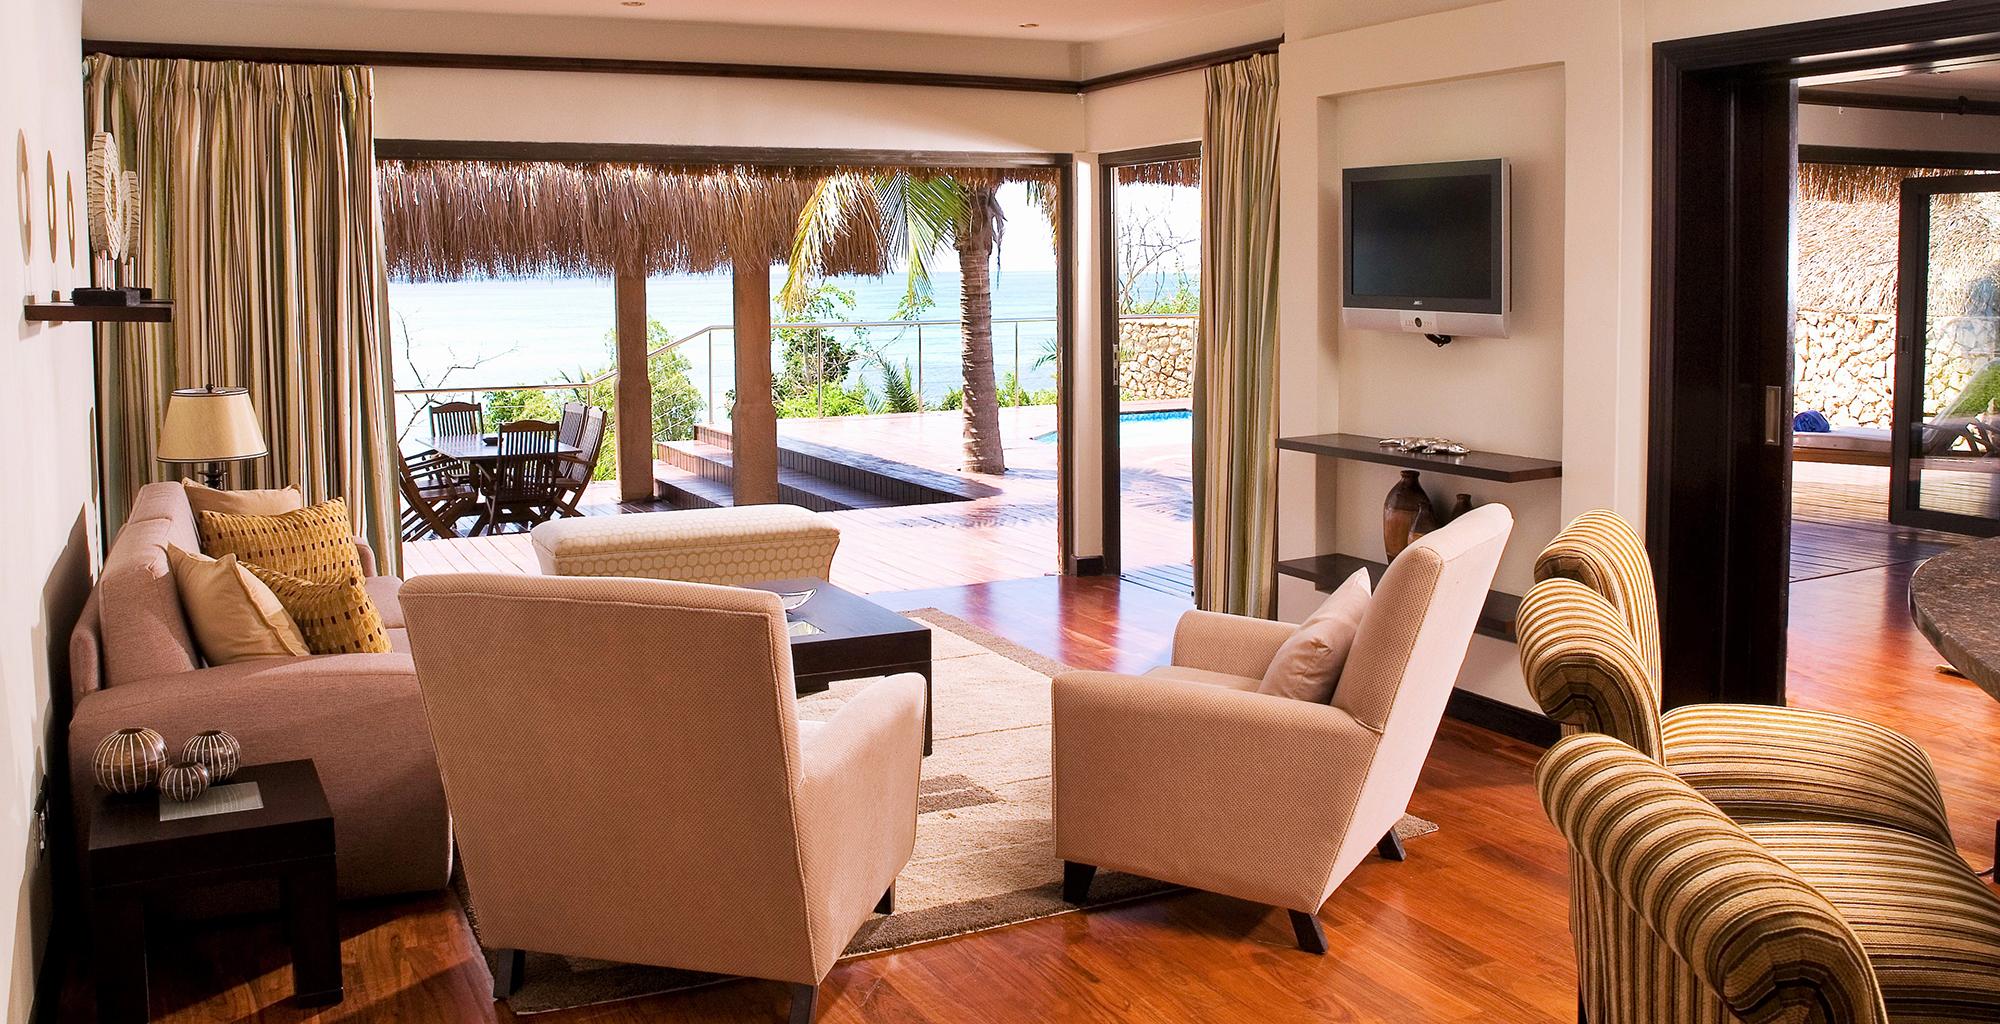 Mozambique-Bazaruto-Archipelago-Anantara-Lounge